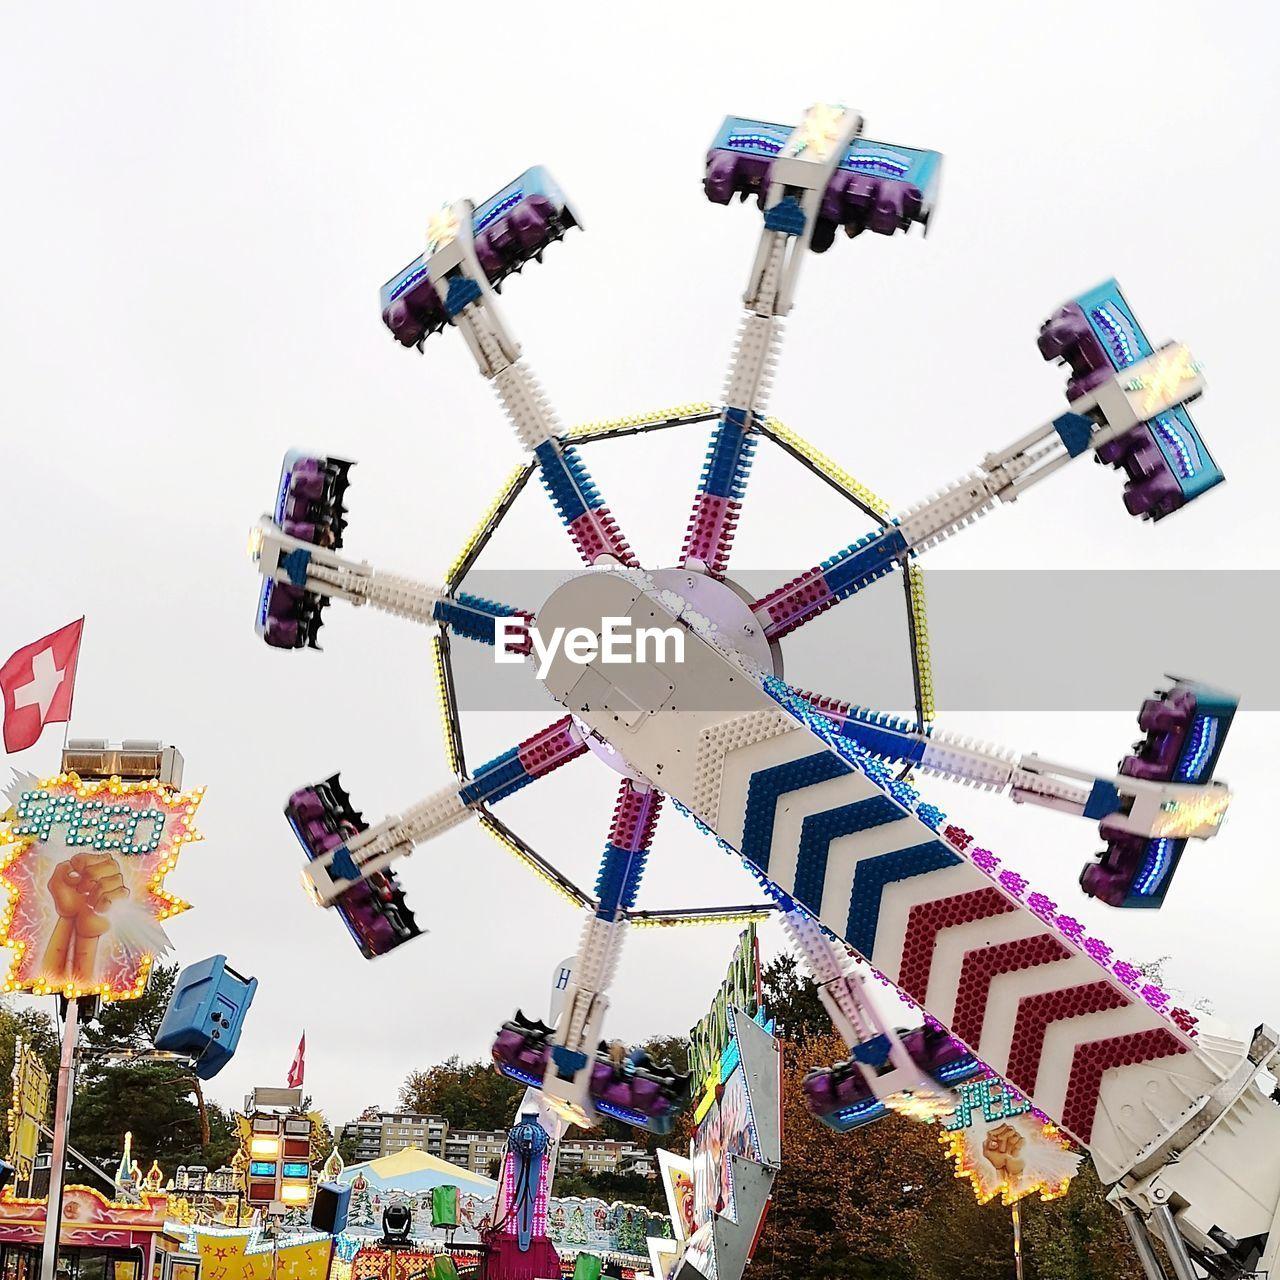 amusement park, amusement park ride, arts culture and entertainment, low angle view, sky, built structure, architecture, multi colored, leisure activity, enjoyment, group of people, decoration, fun, ferris wheel, building exterior, nature, carnival, hanging